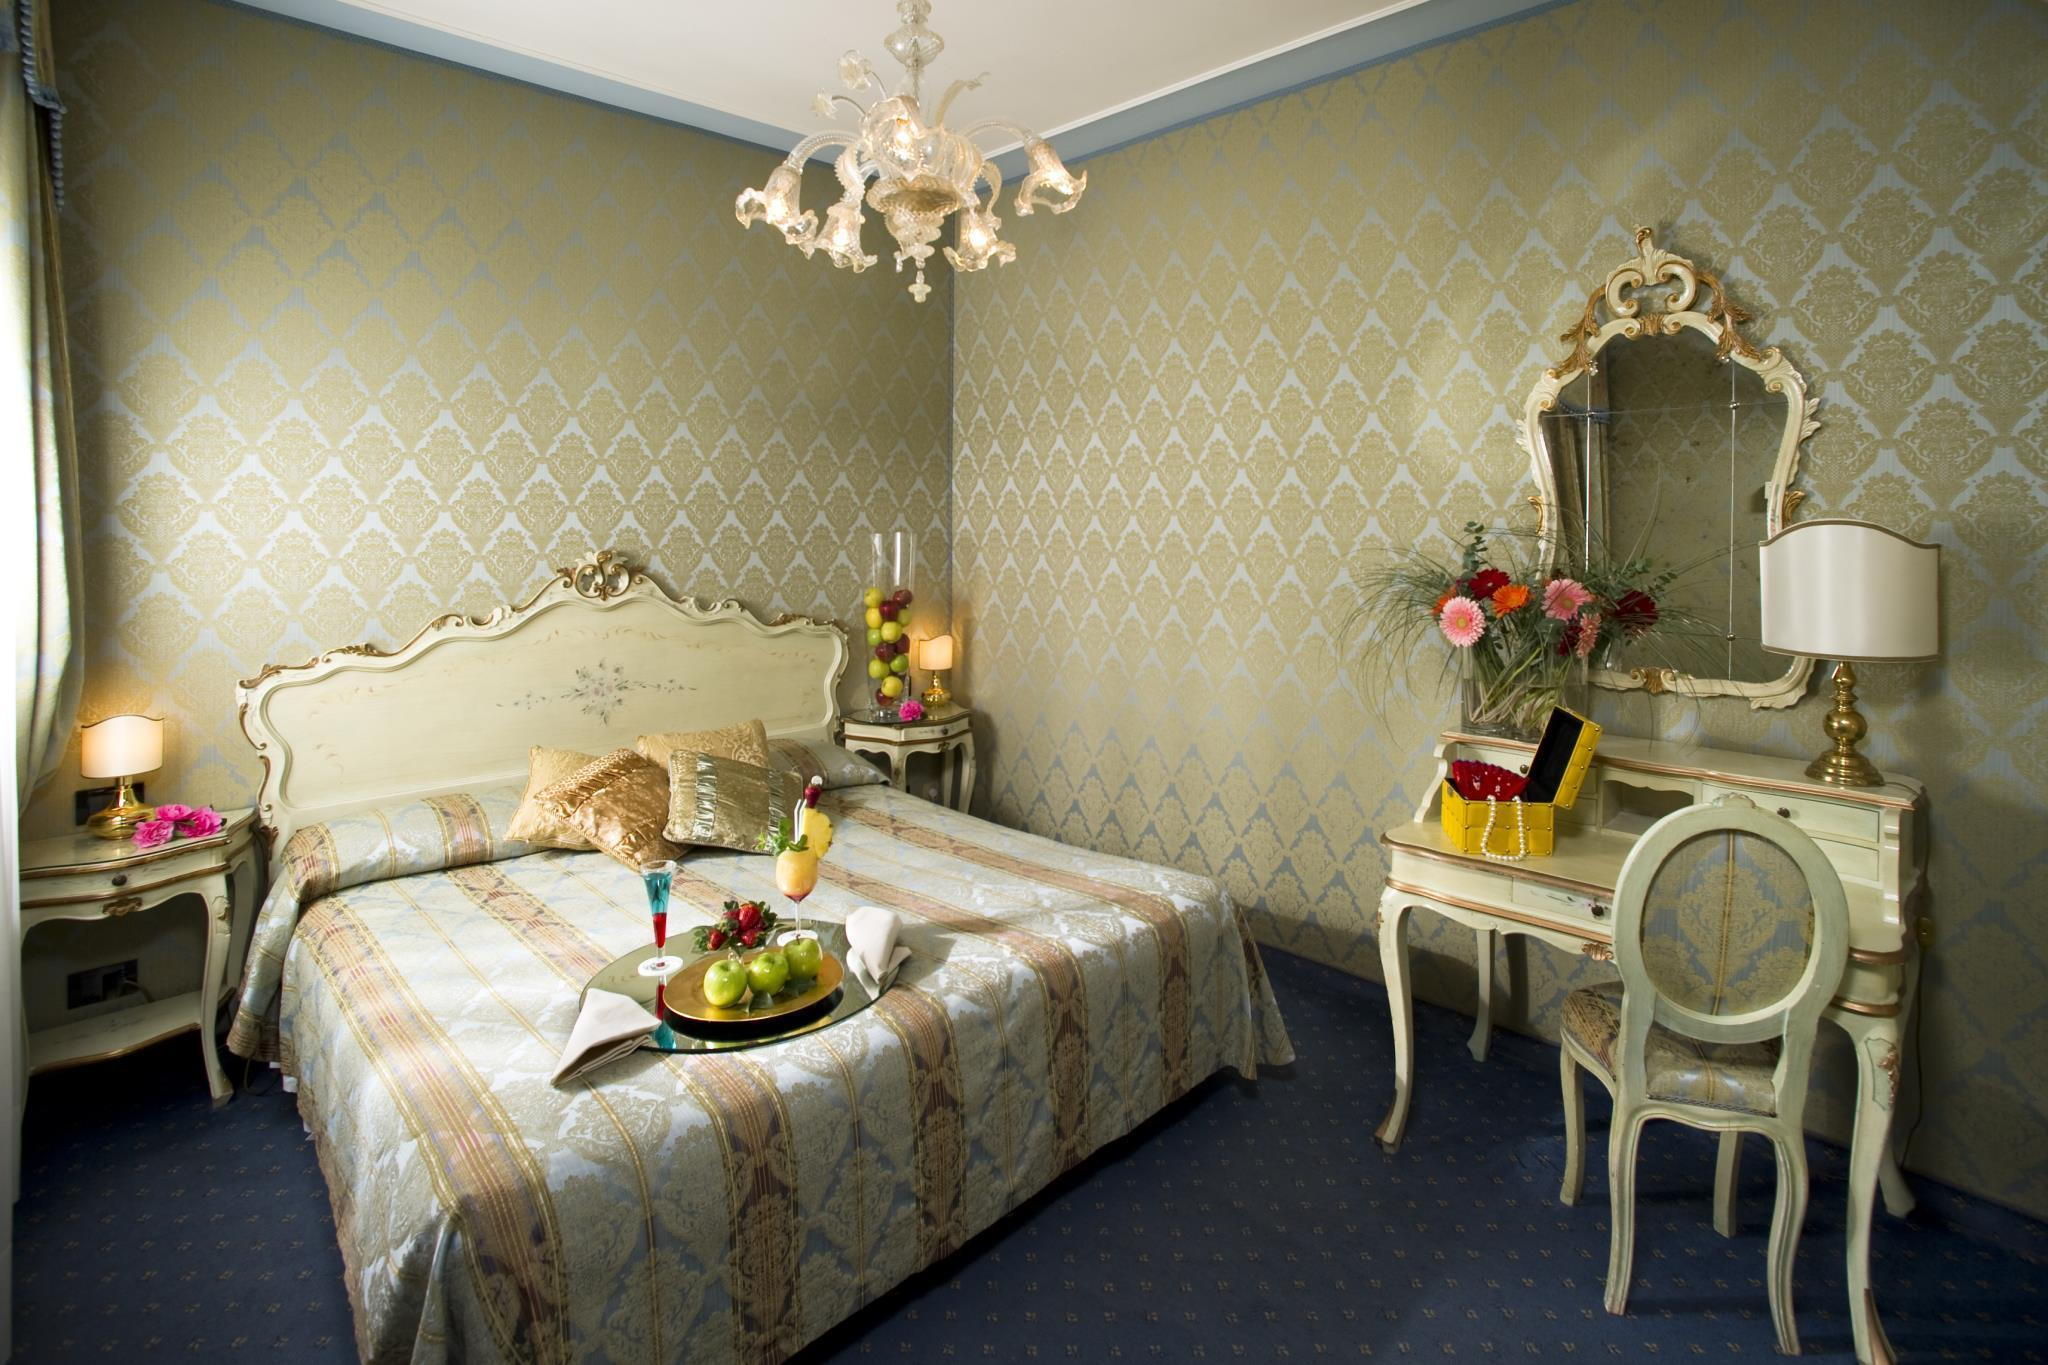 Hotel Carlton On The Grand Venice Standard Room Photos